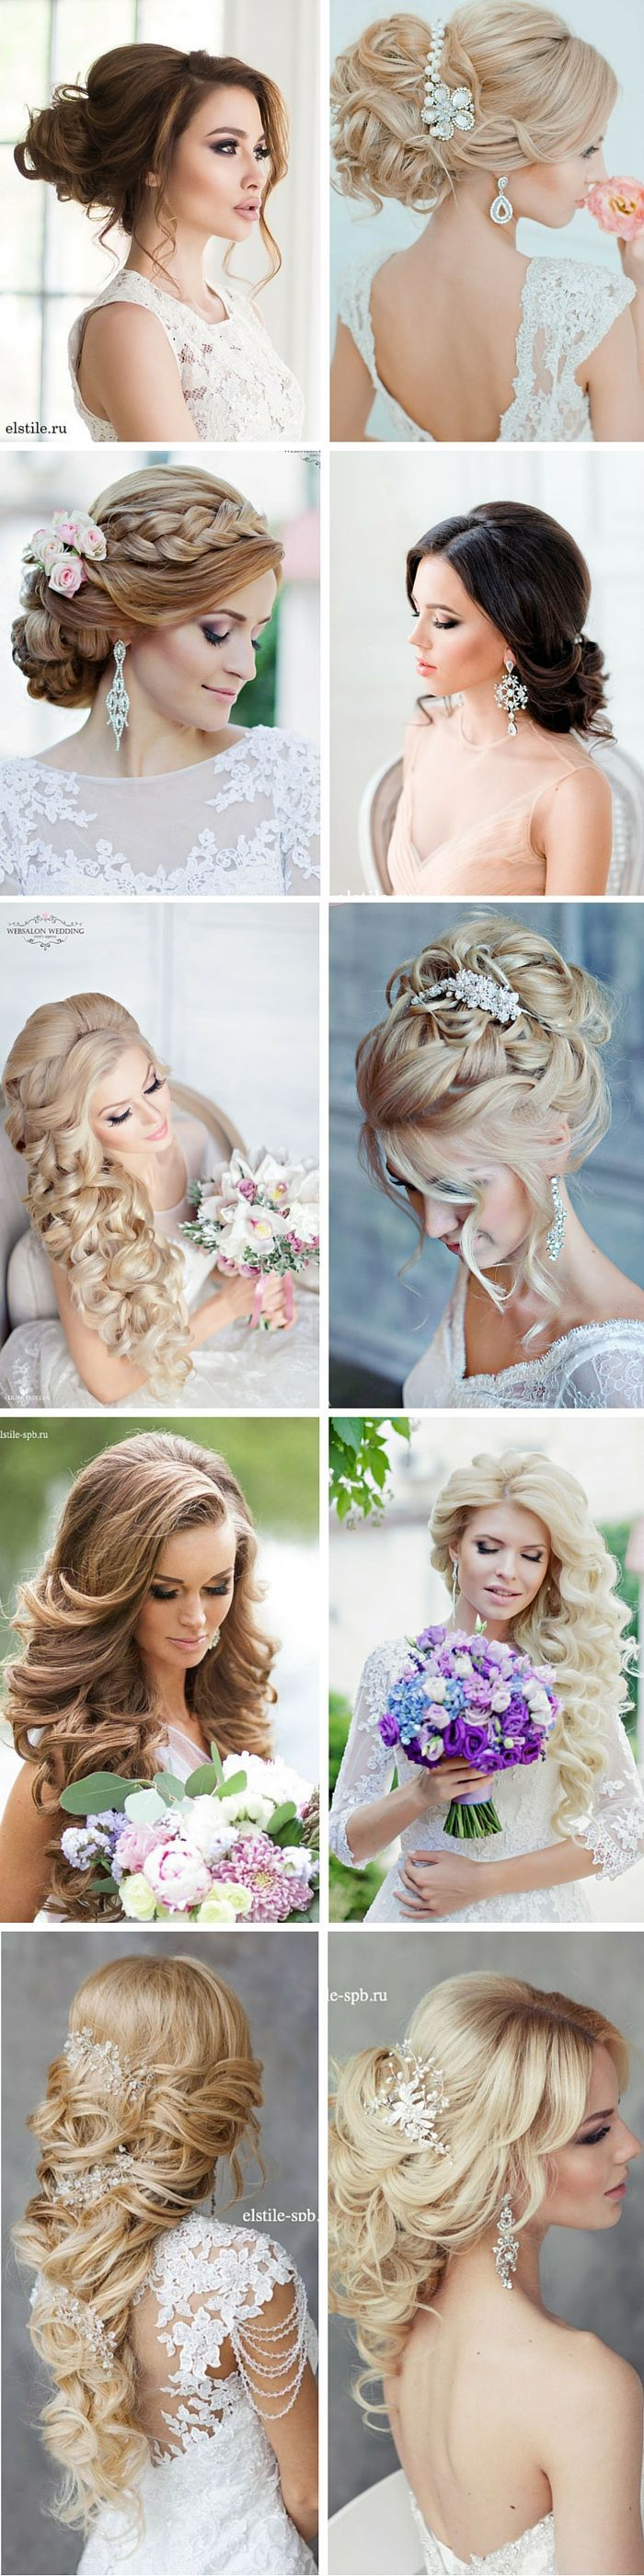 best wedding ideas images on pinterest weddings bridal